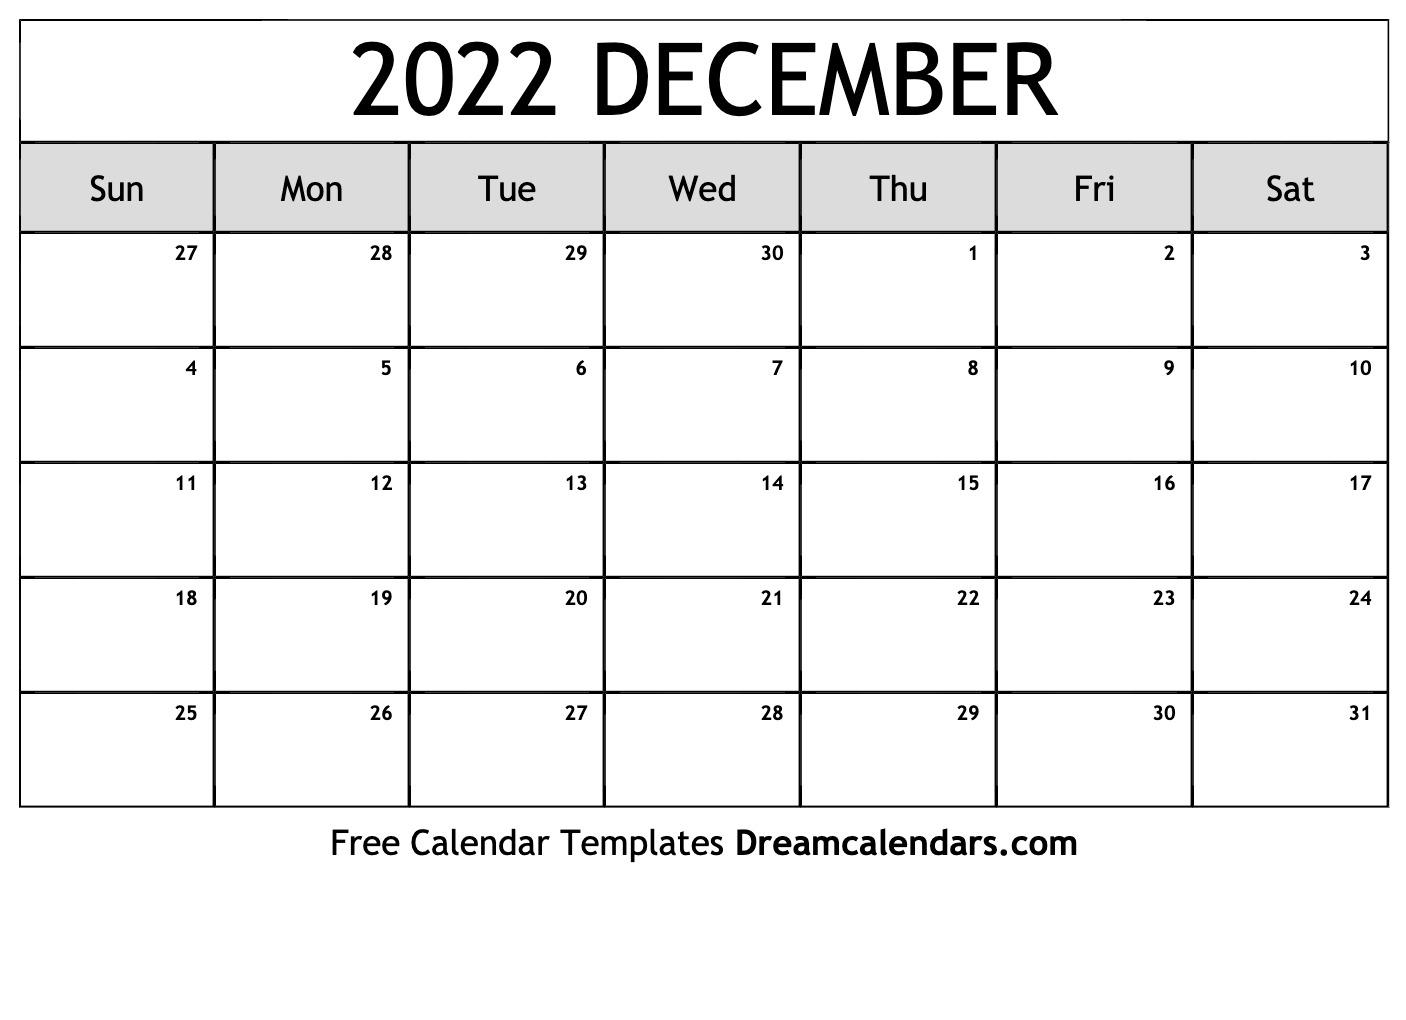 December 2022 Calendar   Free Blank Printable Templates In December January Calendars 2022 2022